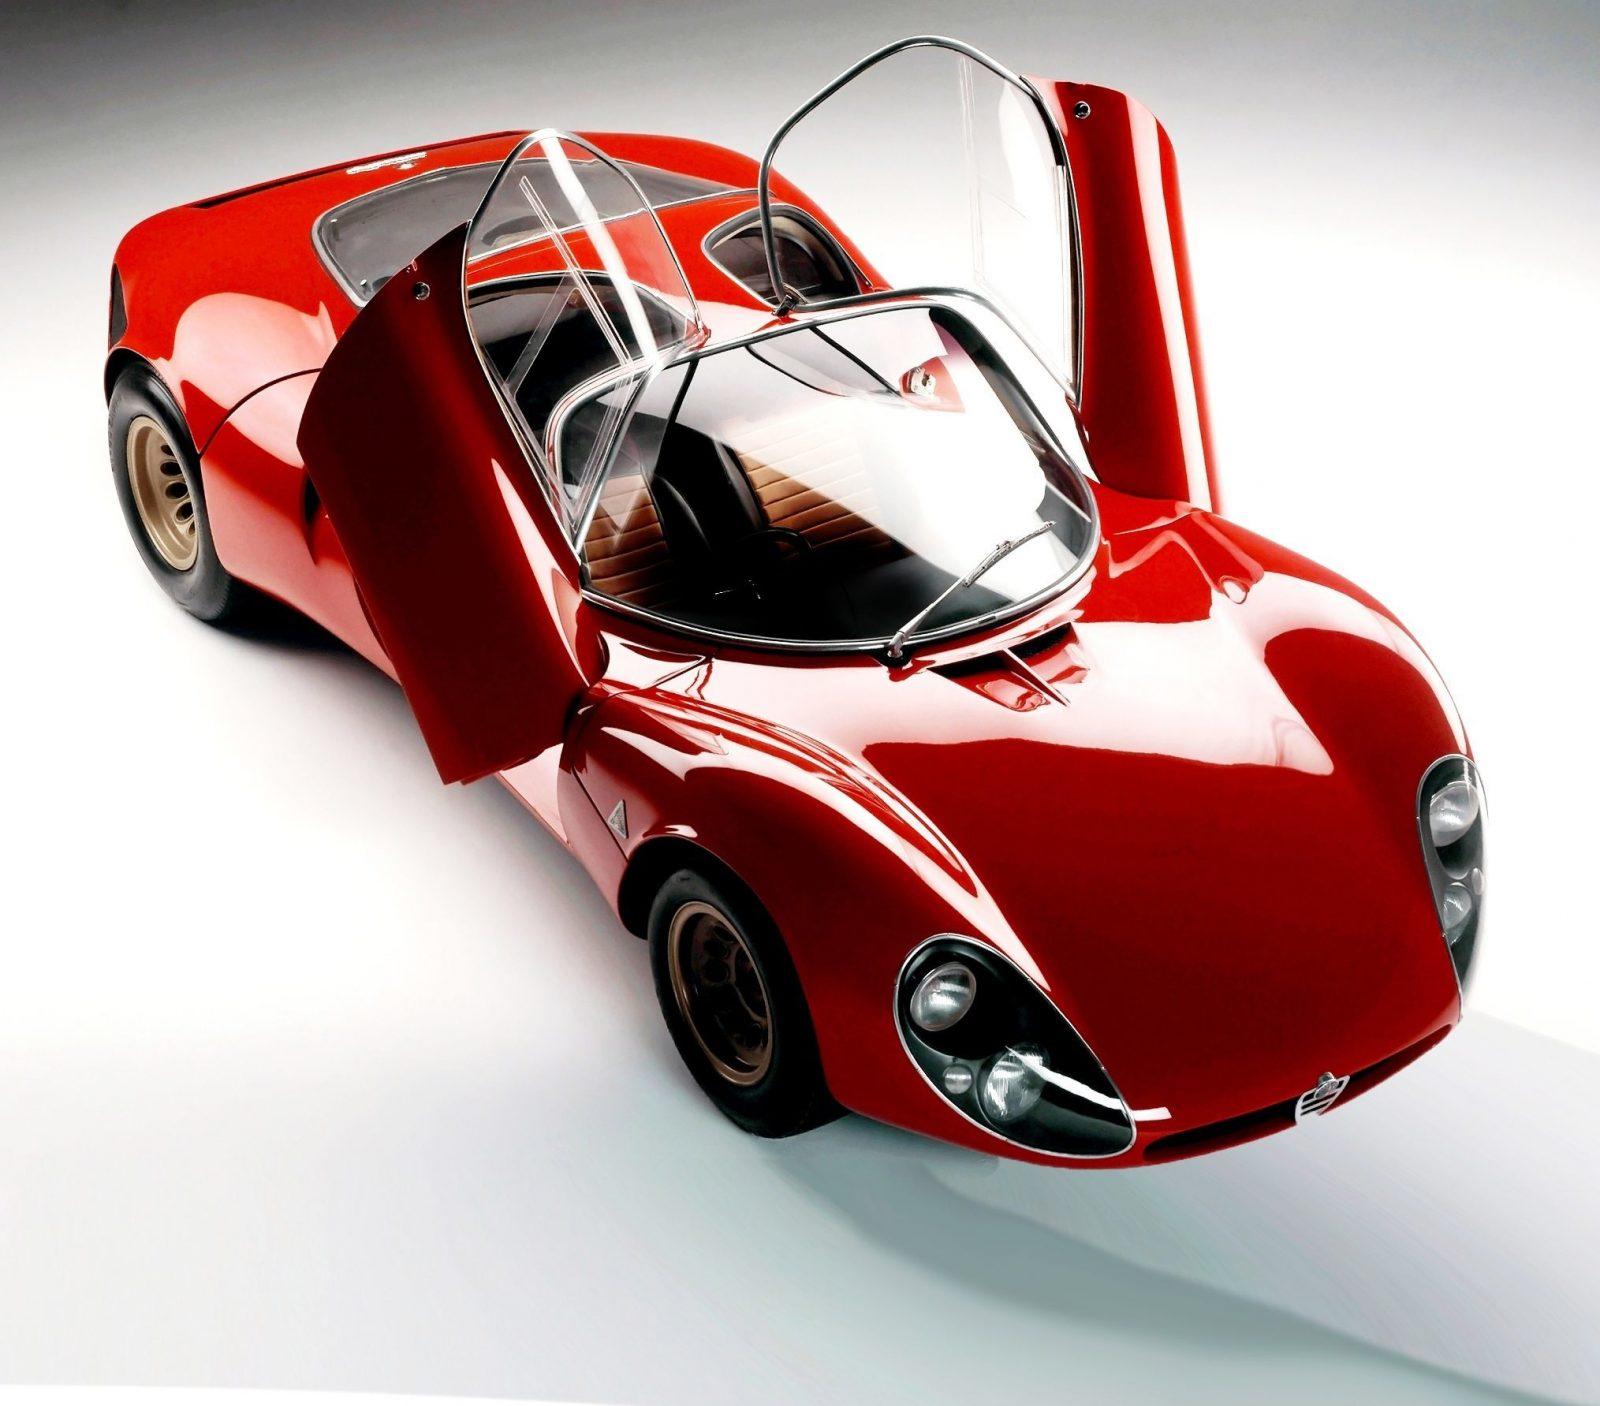 Alfa-Romeo-Tipo-33-Stradale-Prototipo-1967-55559555